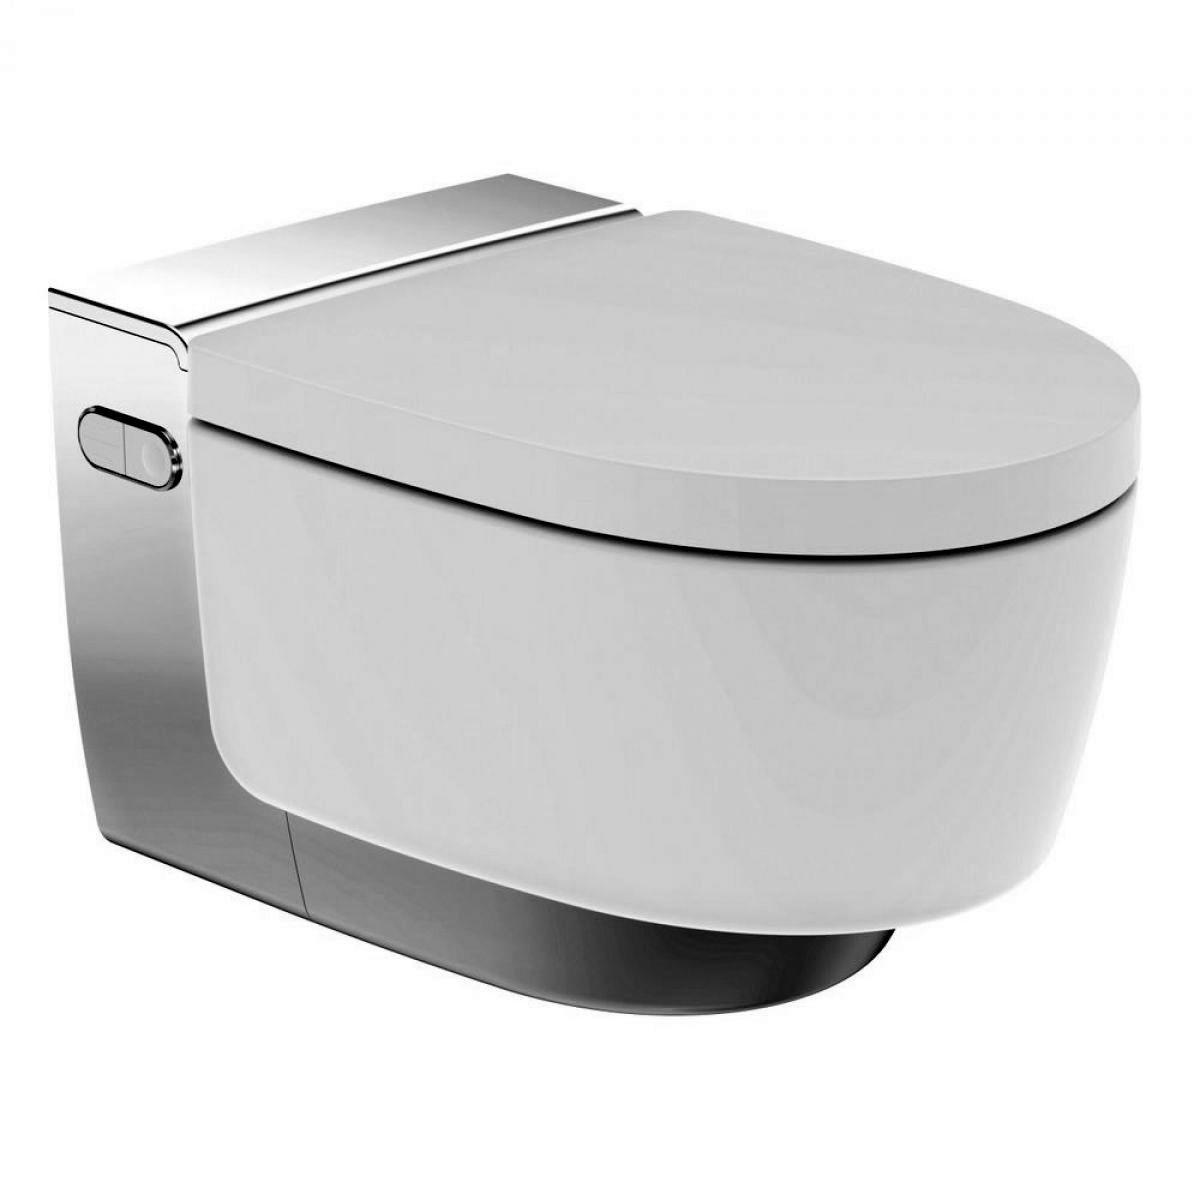 geberit aquaclean mera comfort shower toilet uk bathrooms. Black Bedroom Furniture Sets. Home Design Ideas